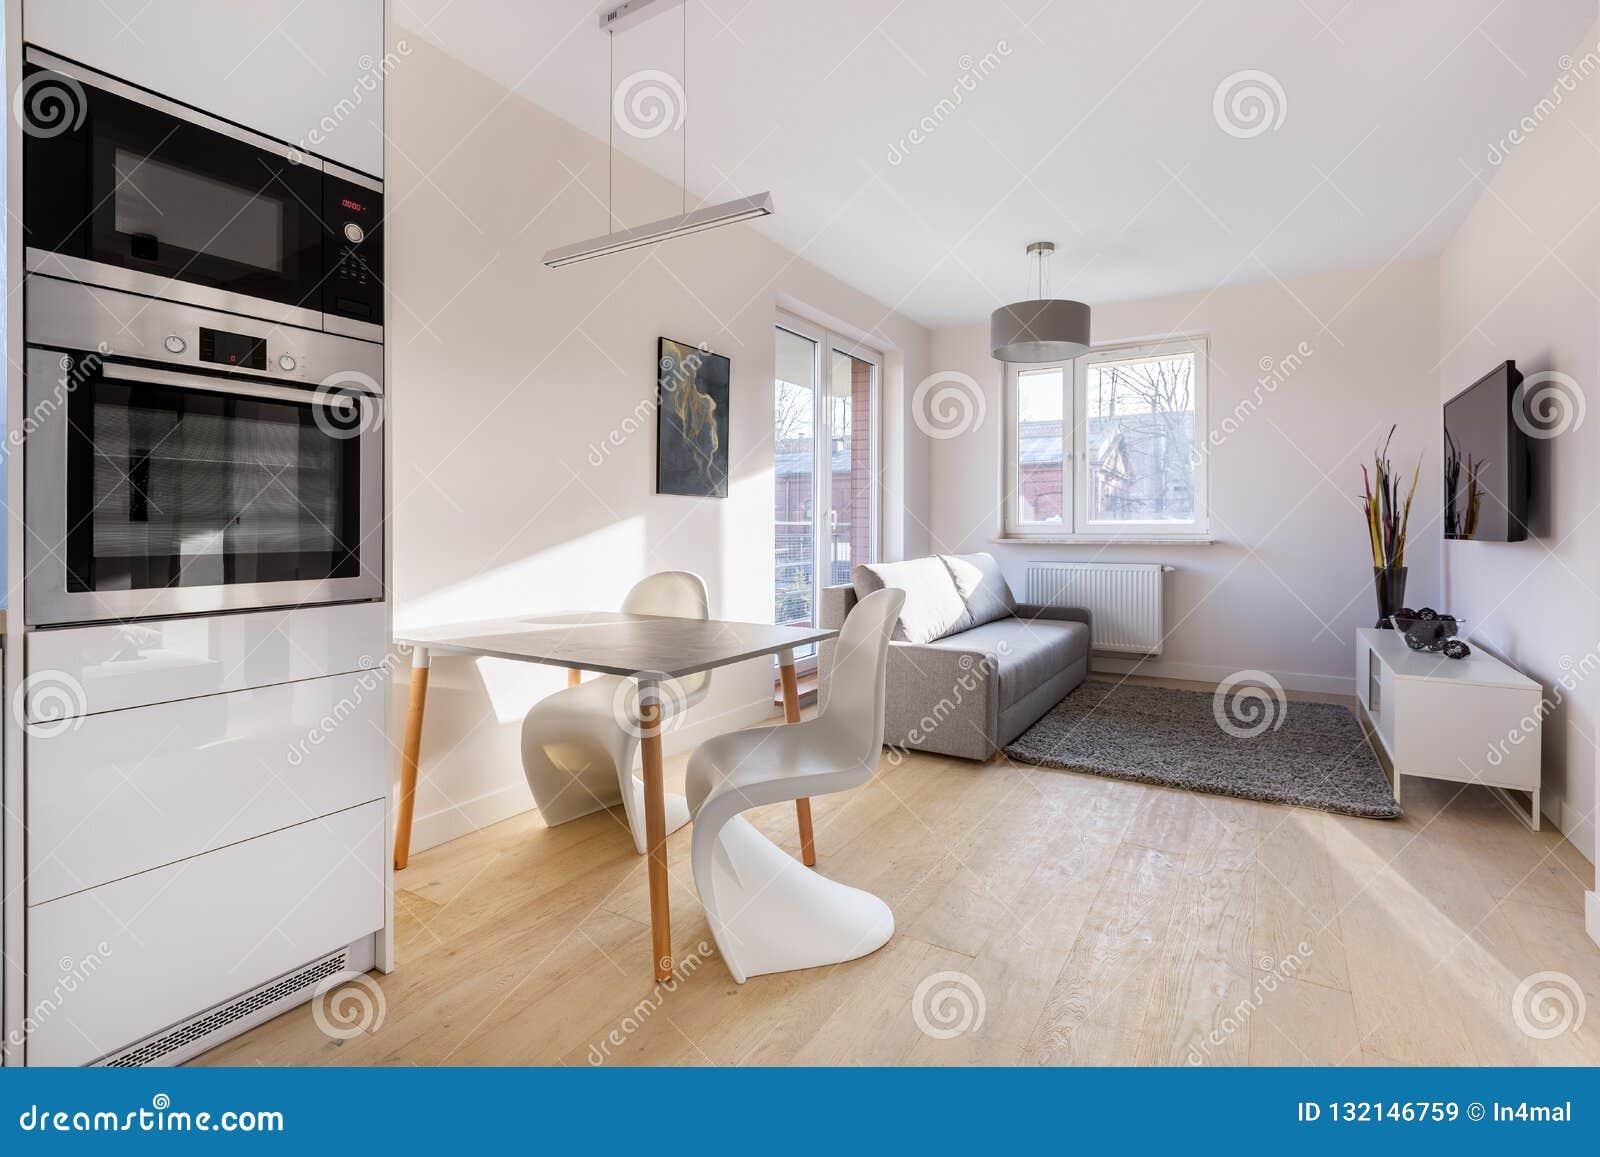 Modern And Small Studio Flat Stock Image - Image of ...